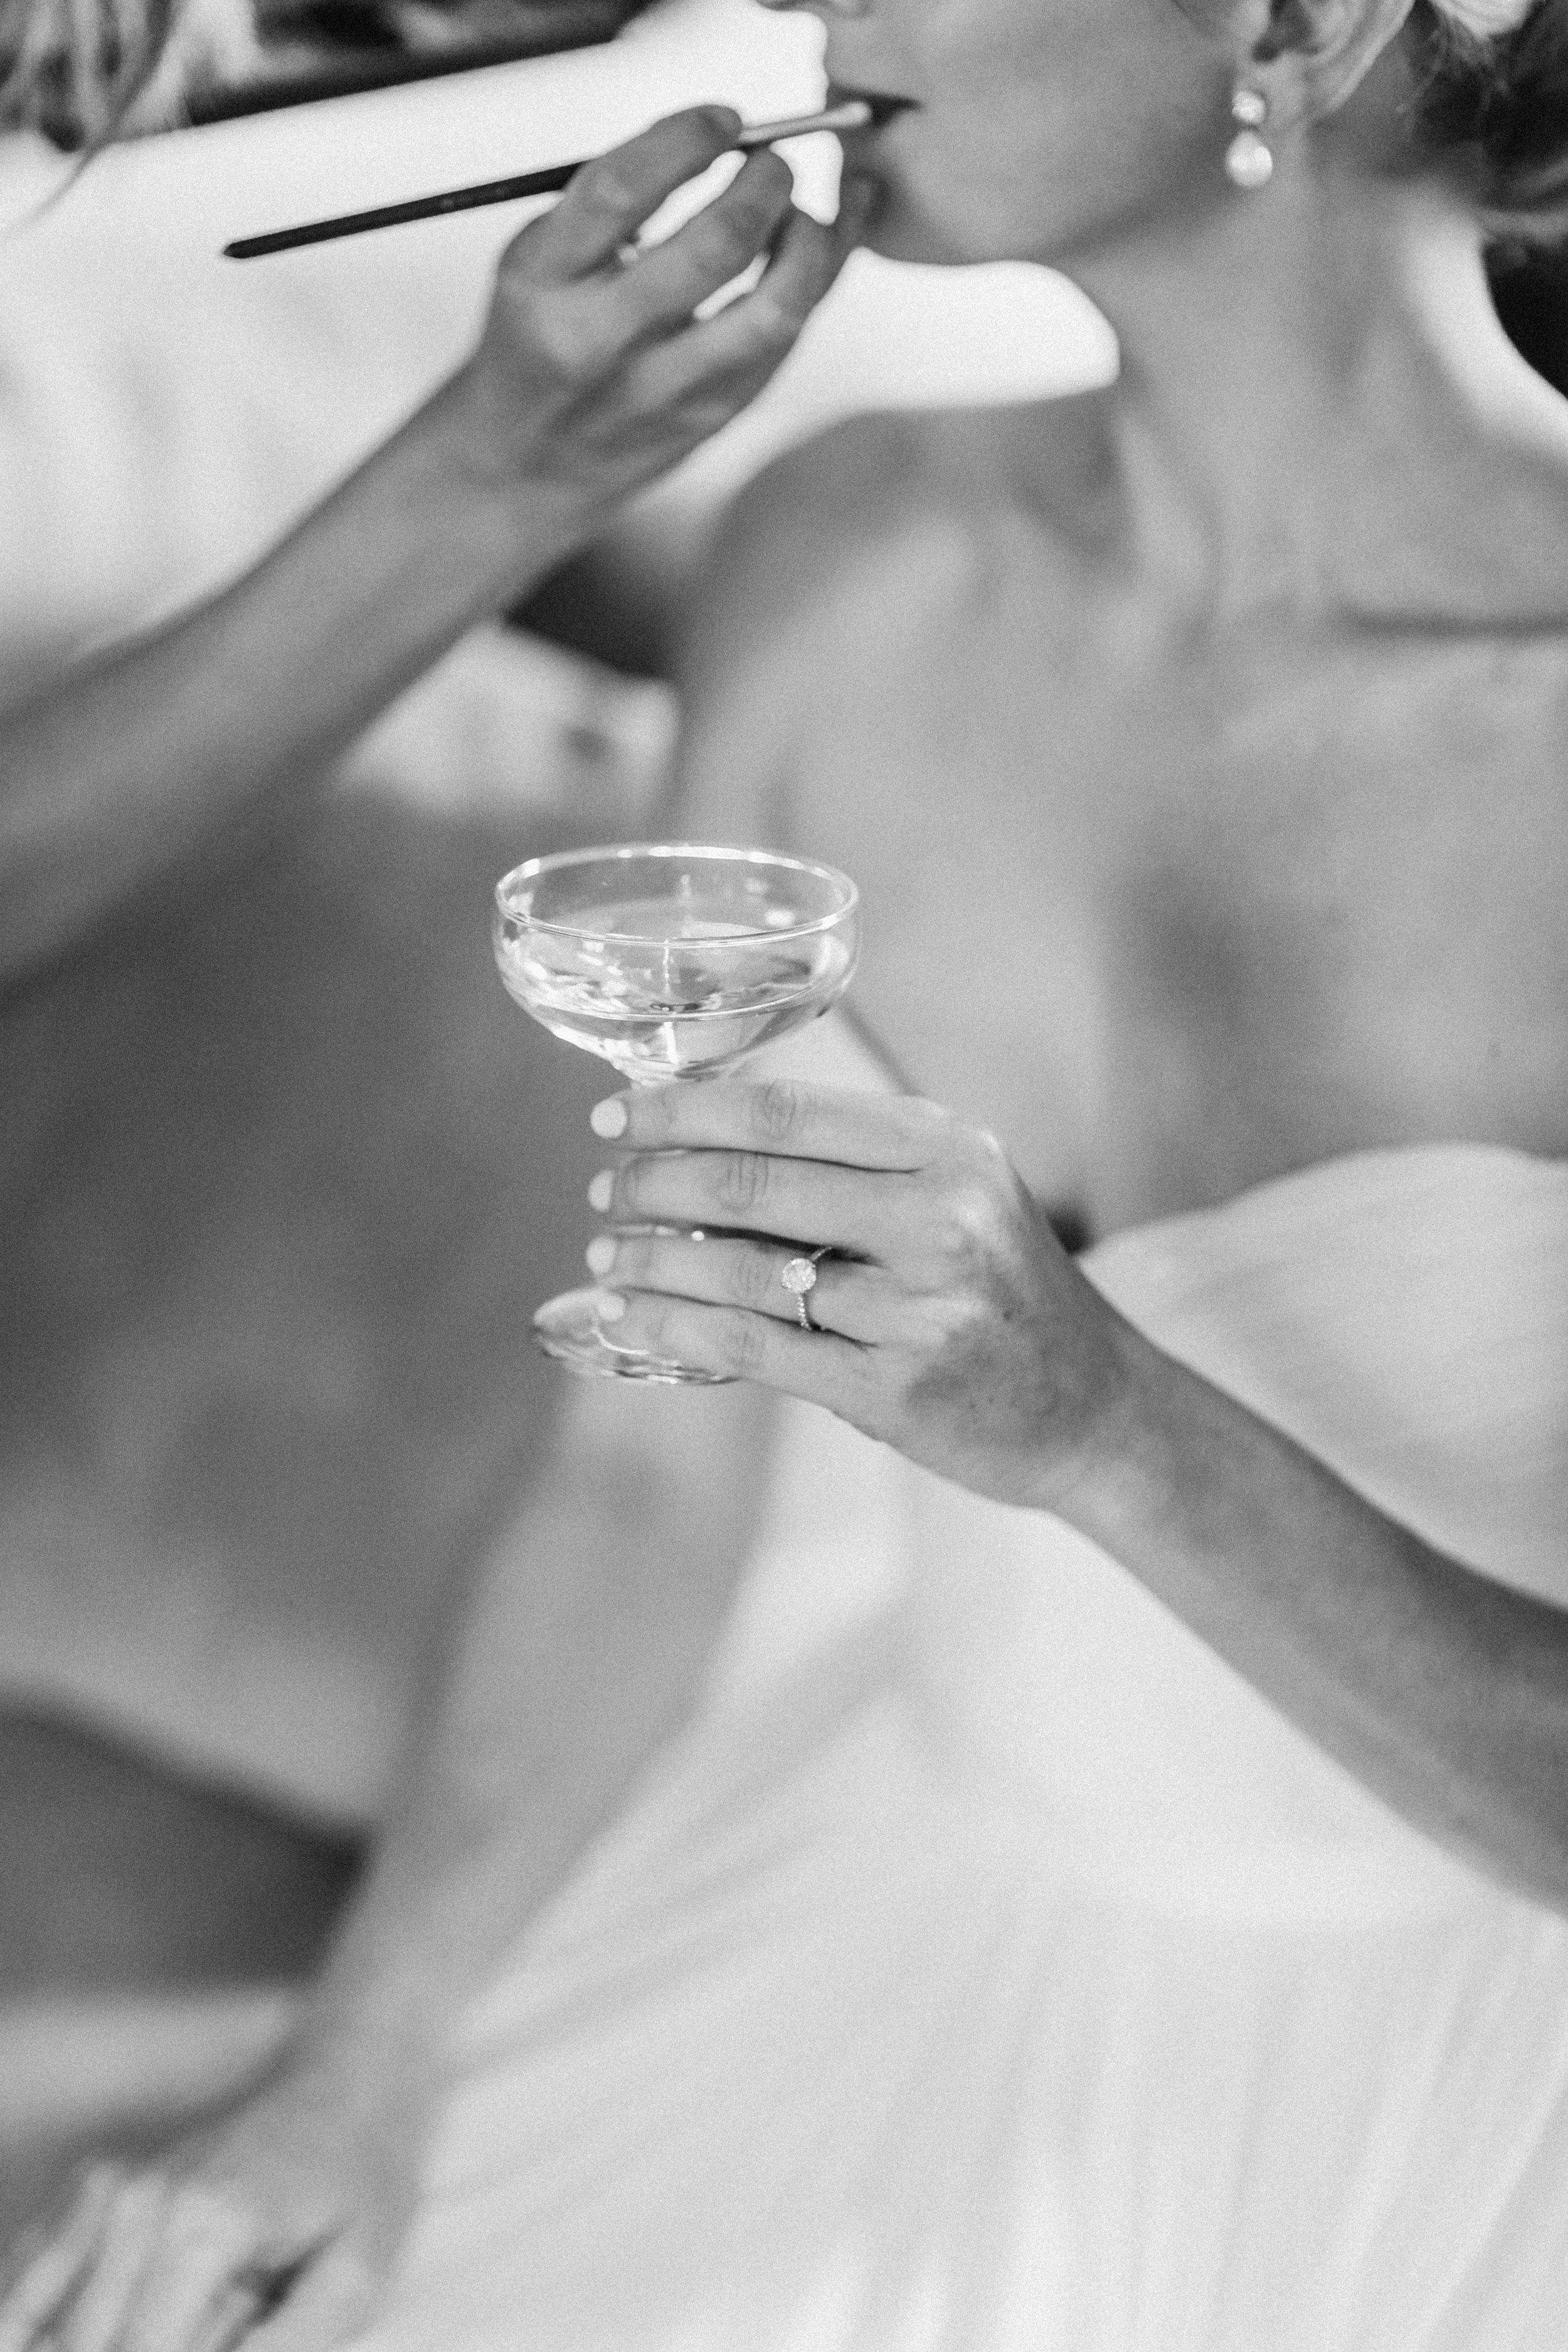 sarah-falugo-wedding-photographer-napa-valley-wedding-lauren-emery-9143.jpg